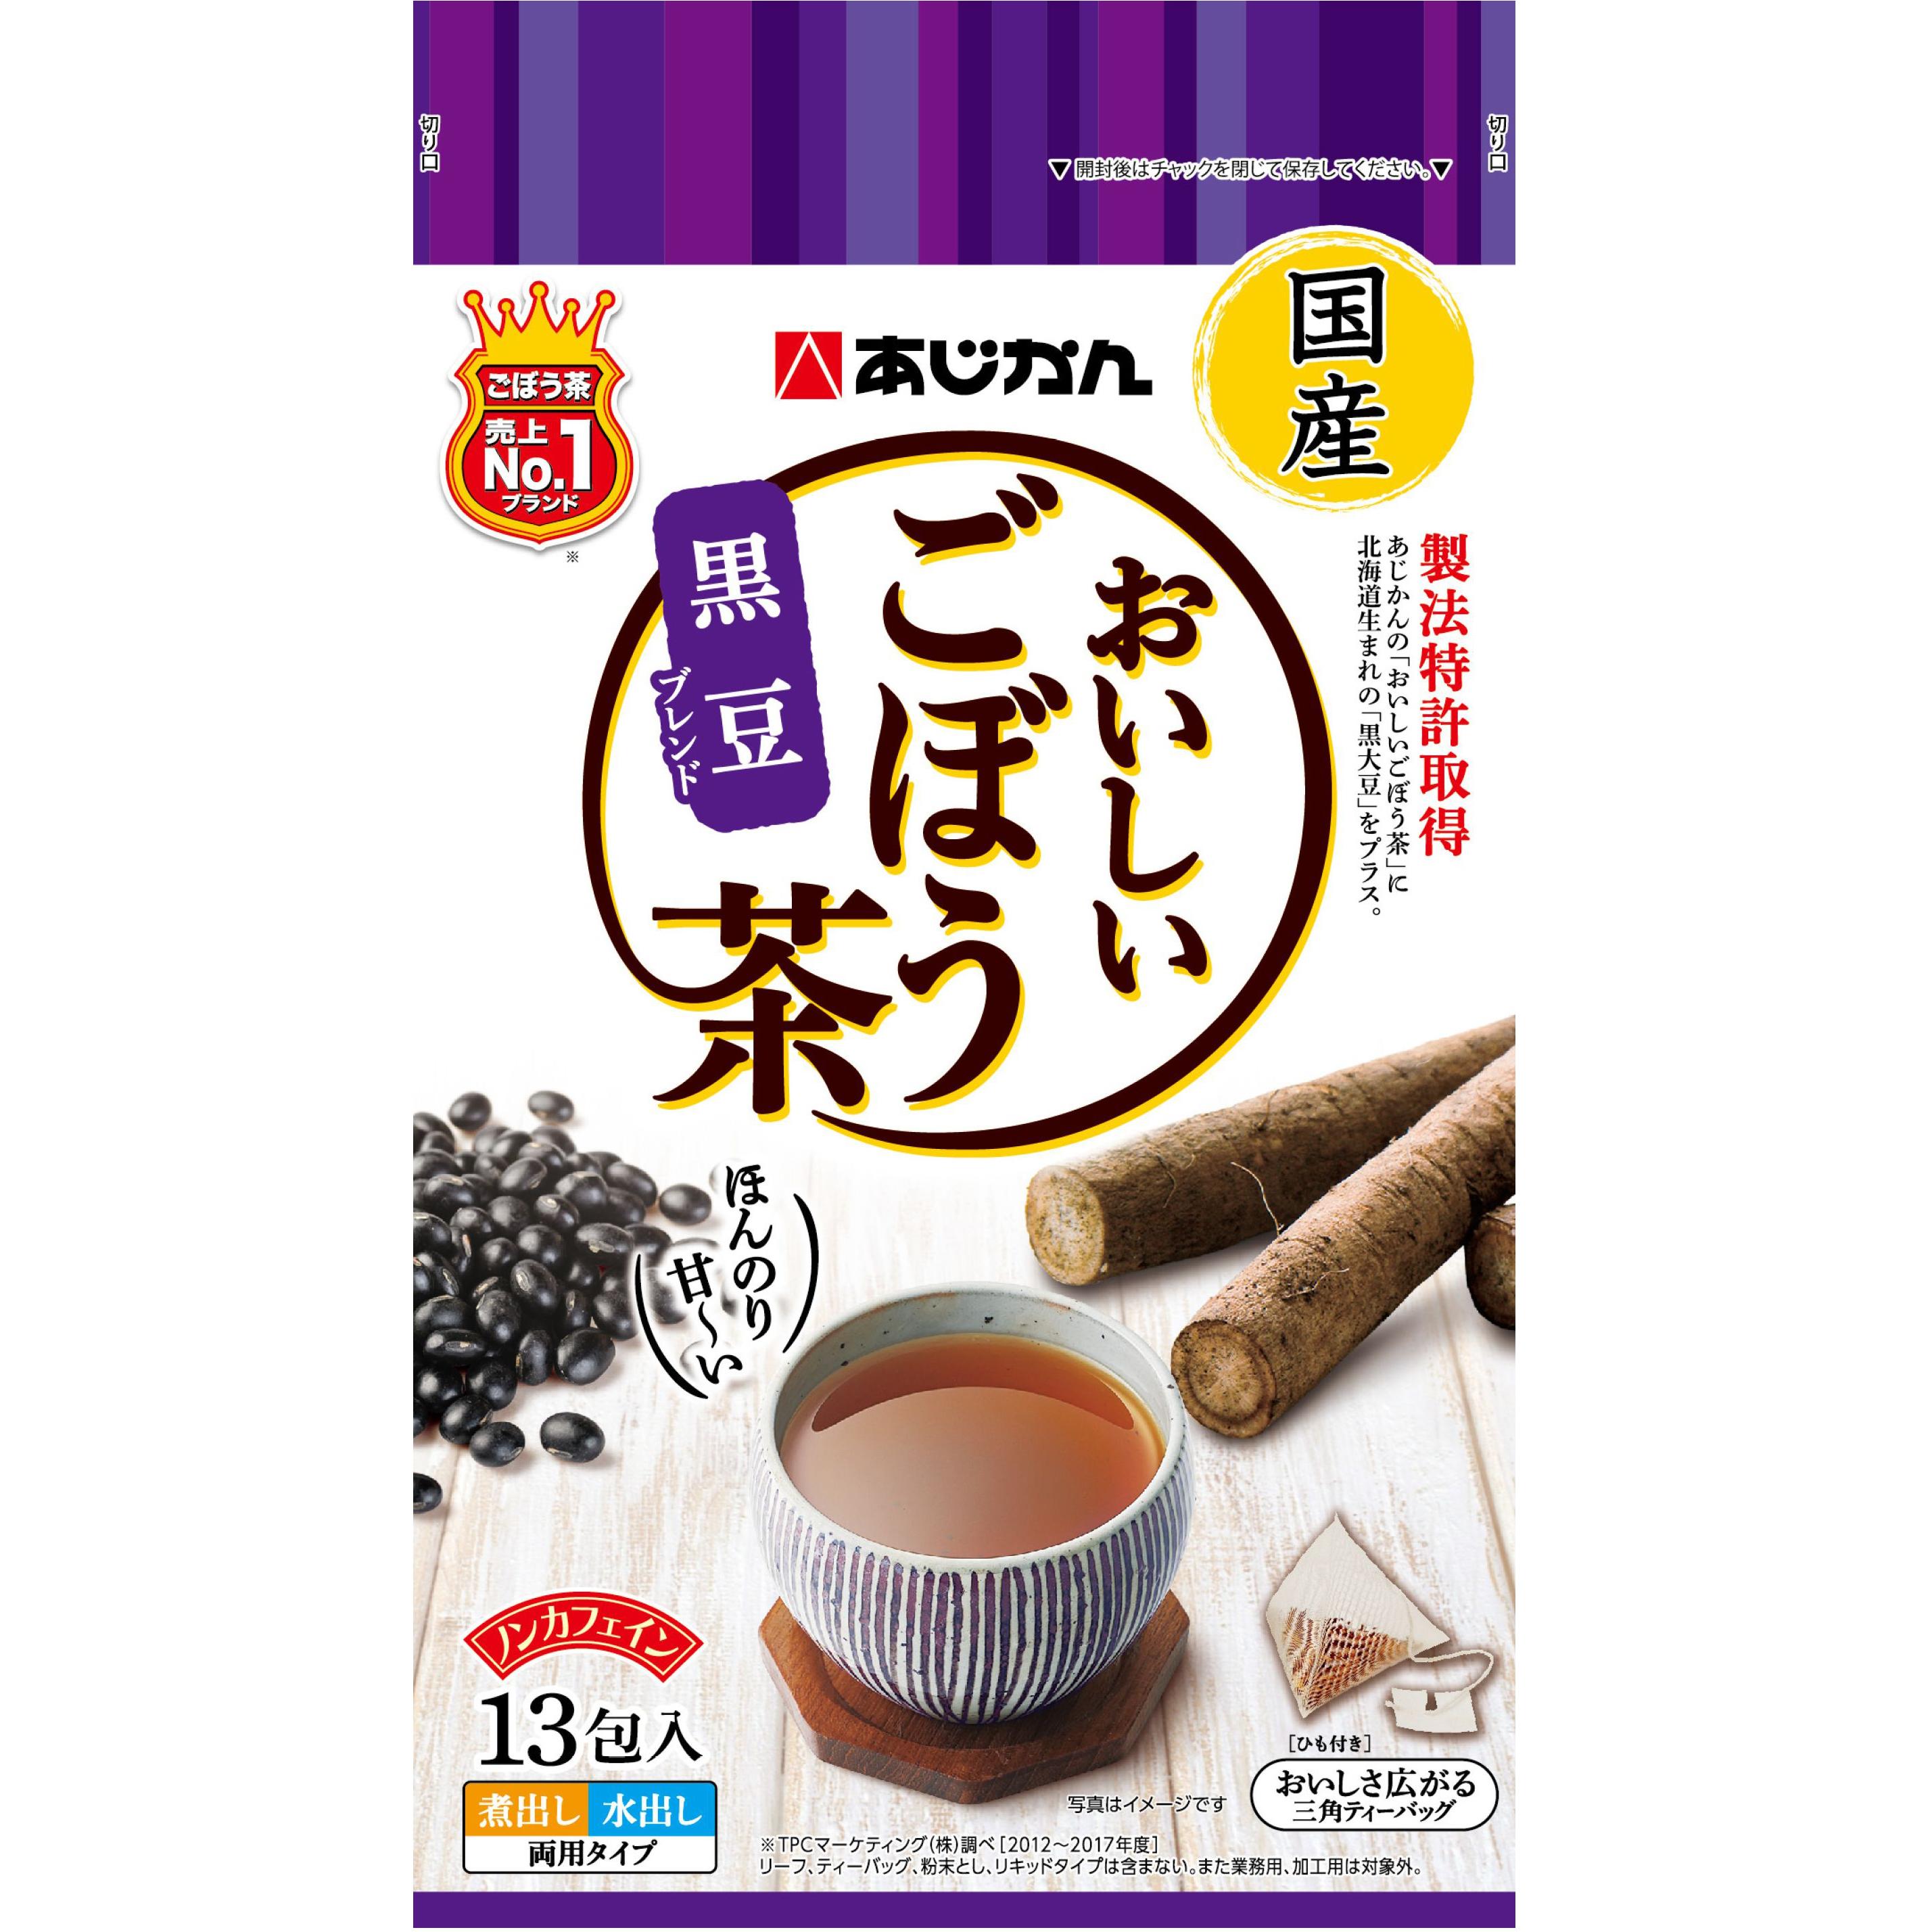 Unique roasting method herbal natural private label tea for women